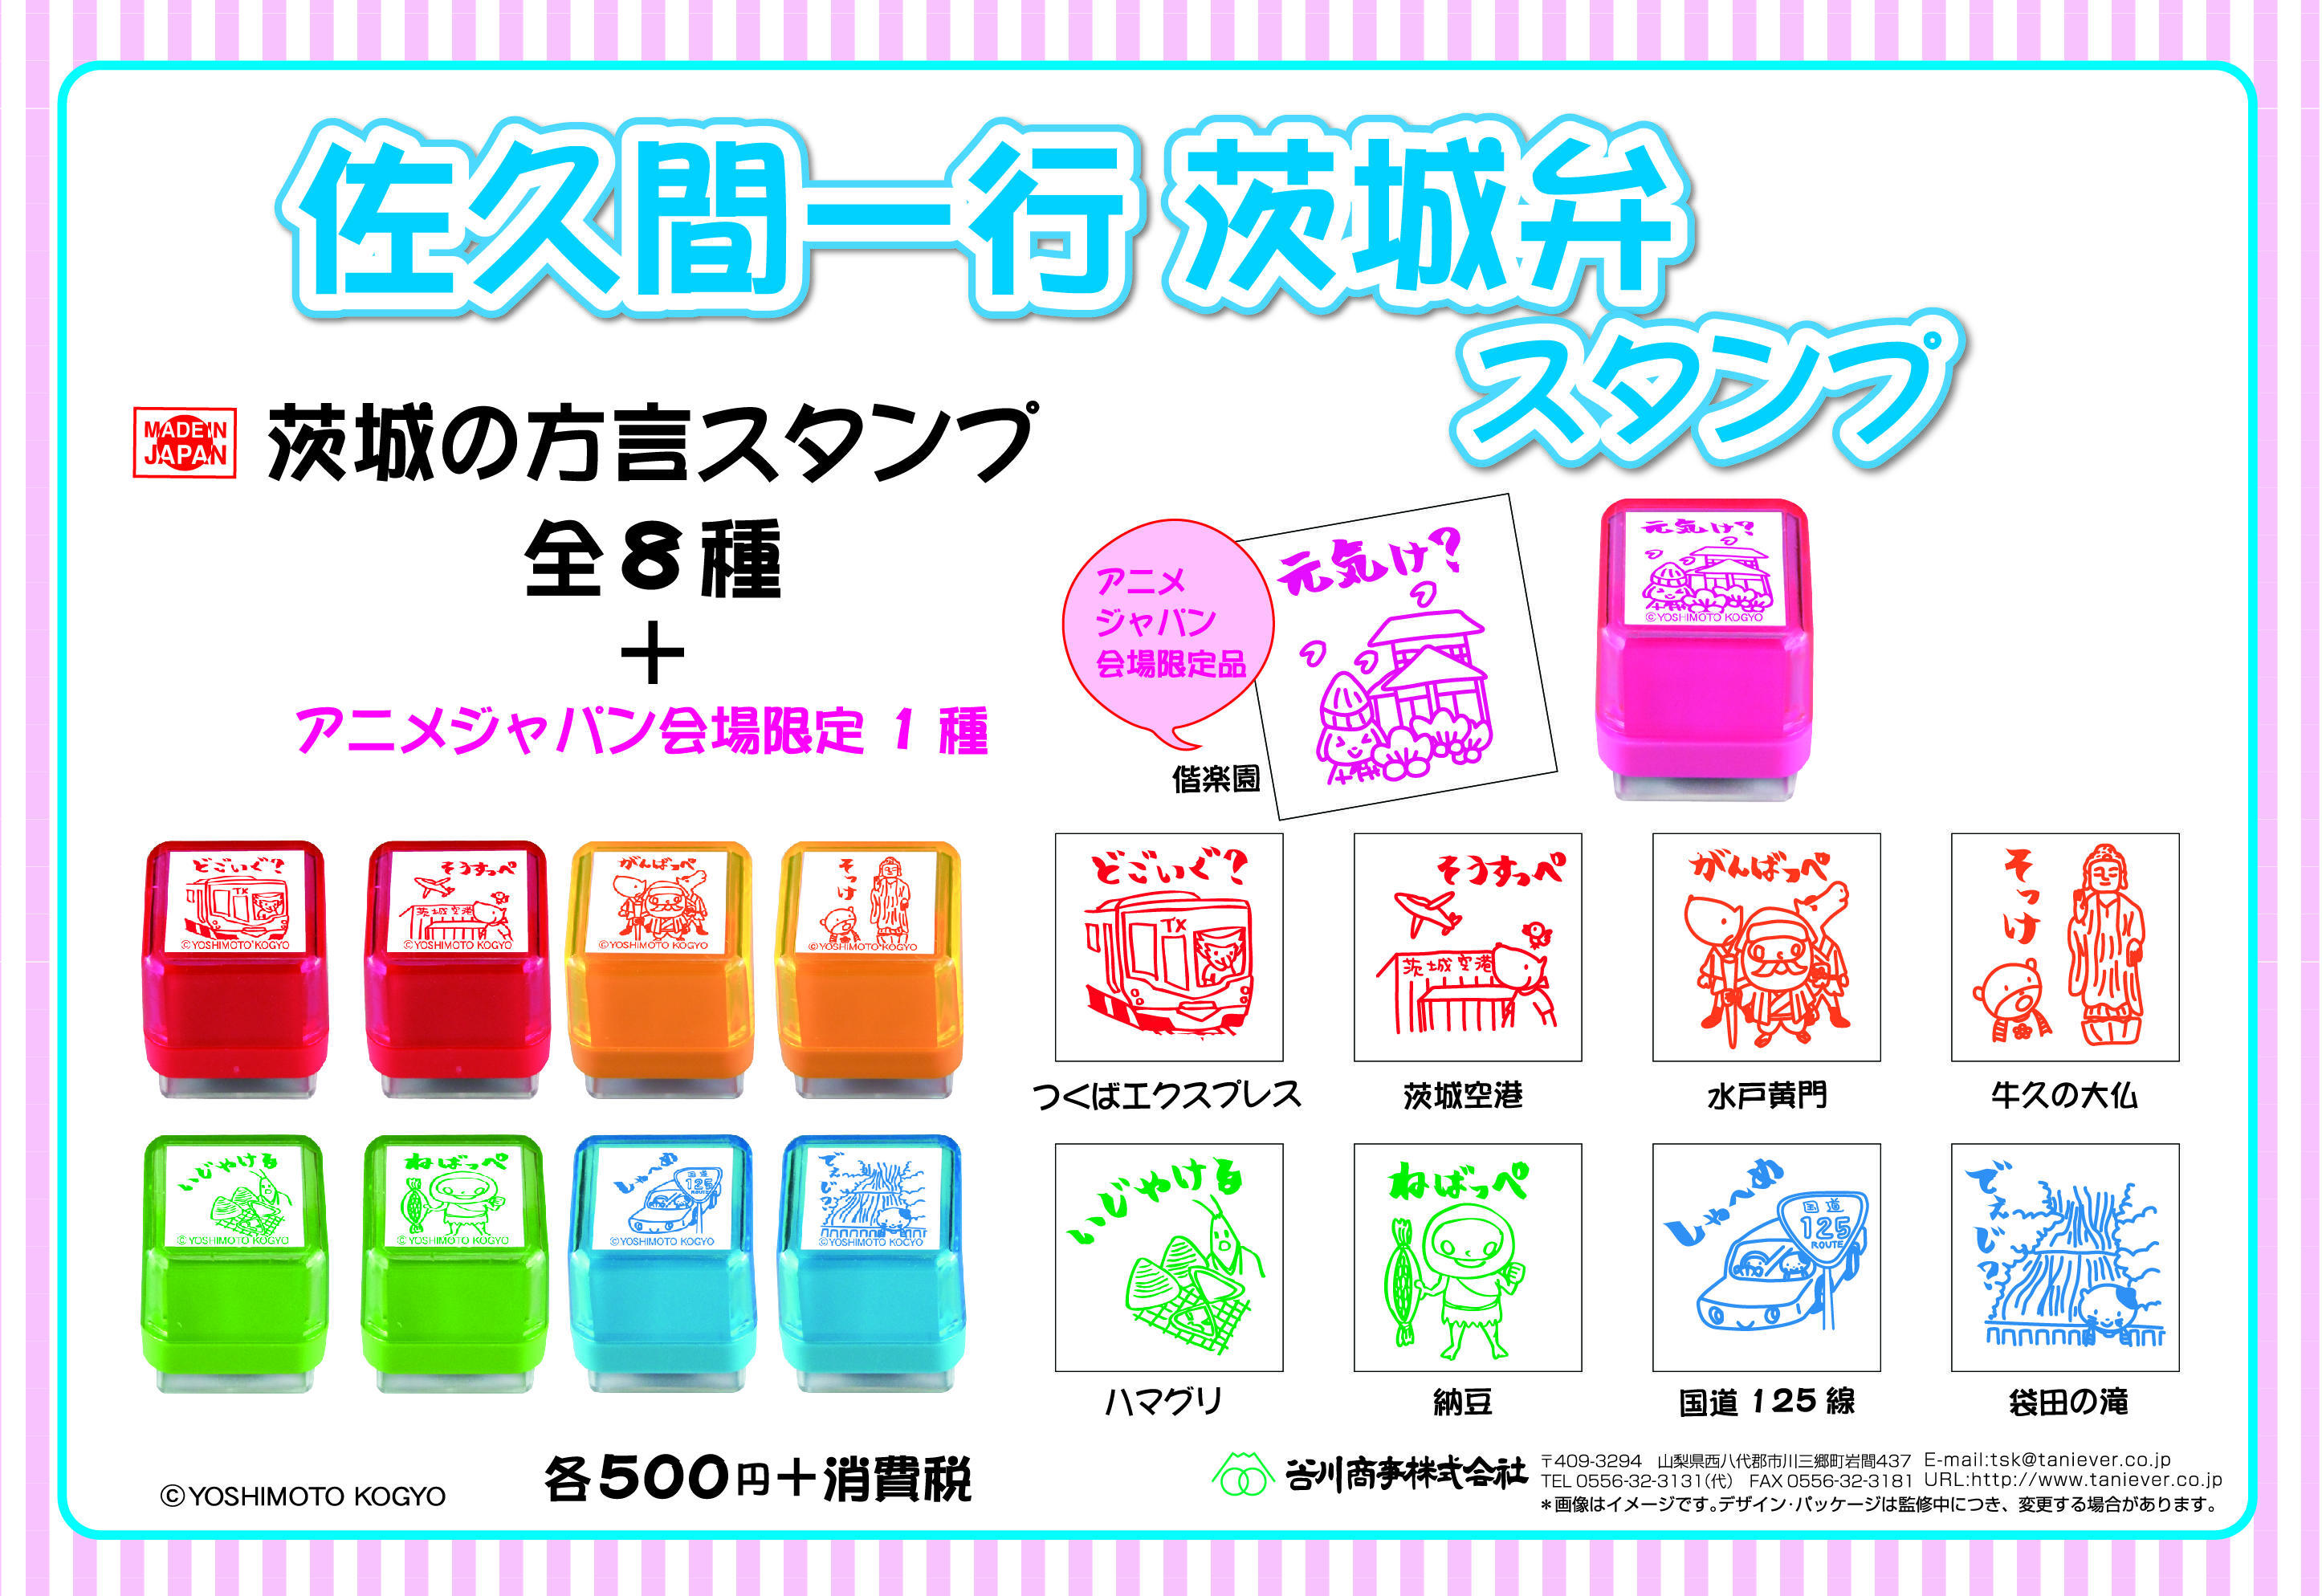 http://news.yoshimoto.co.jp/20170309203455-9e824620ba525bf53969c9e2ae37fa4fa98d0e64.jpg